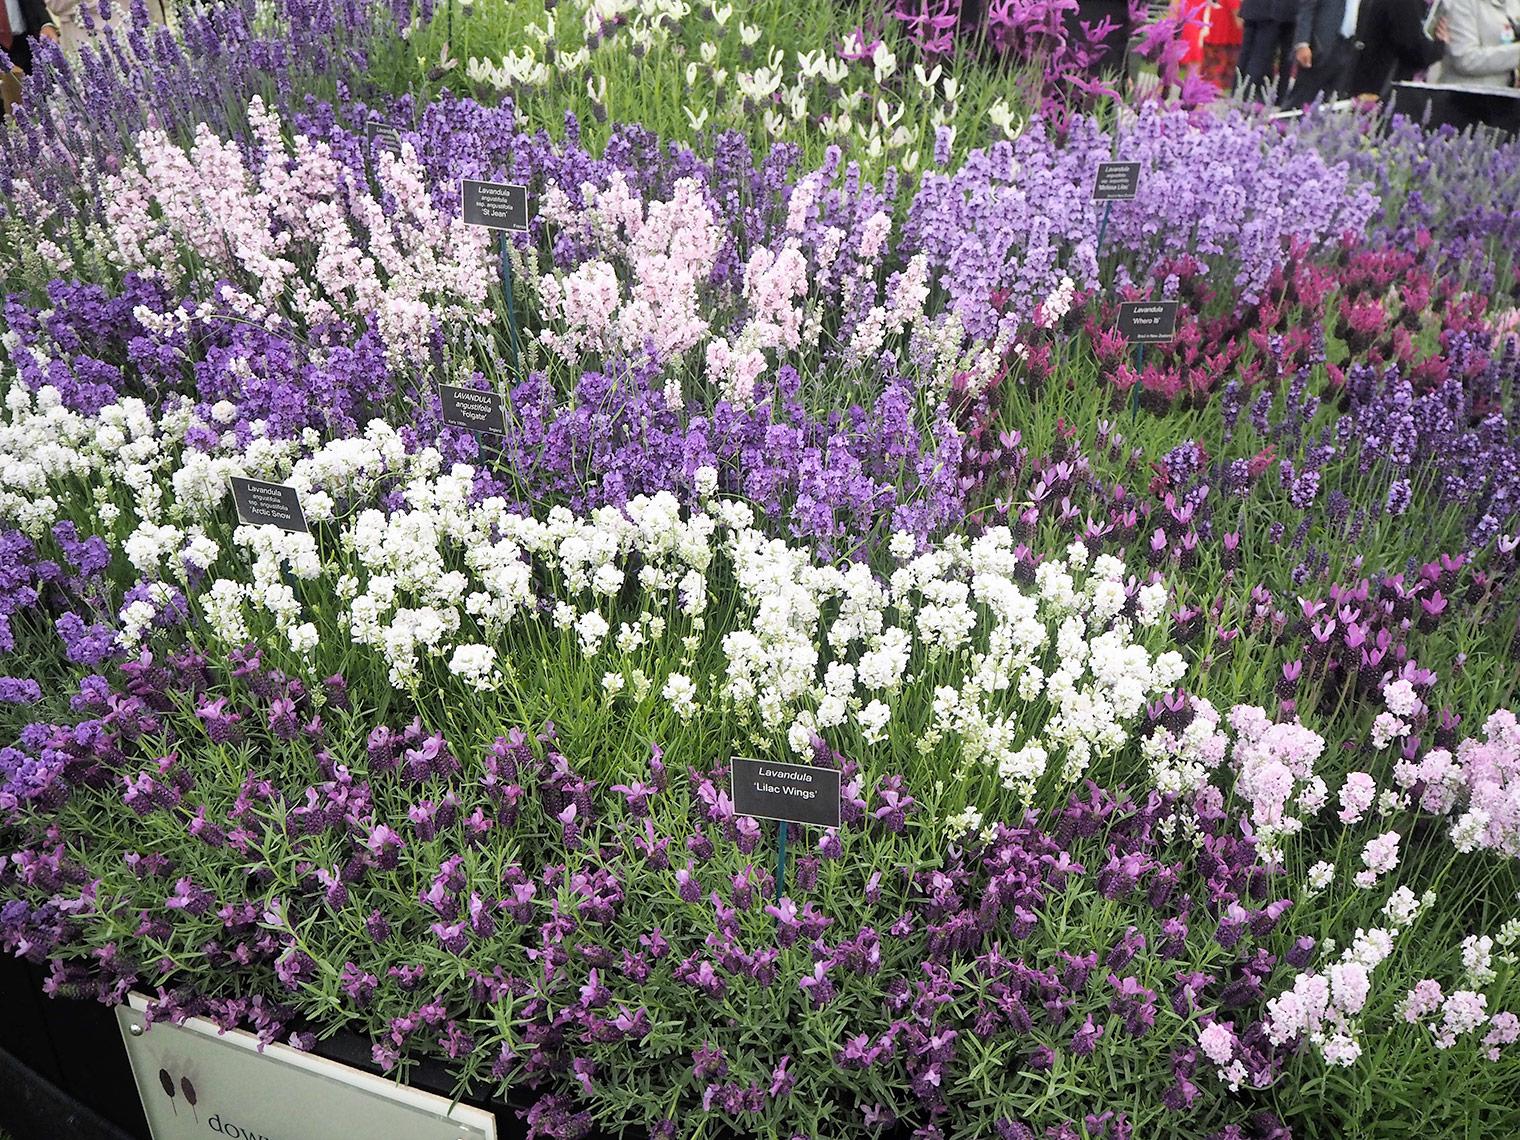 Gardens at Chelsea flower show 2018